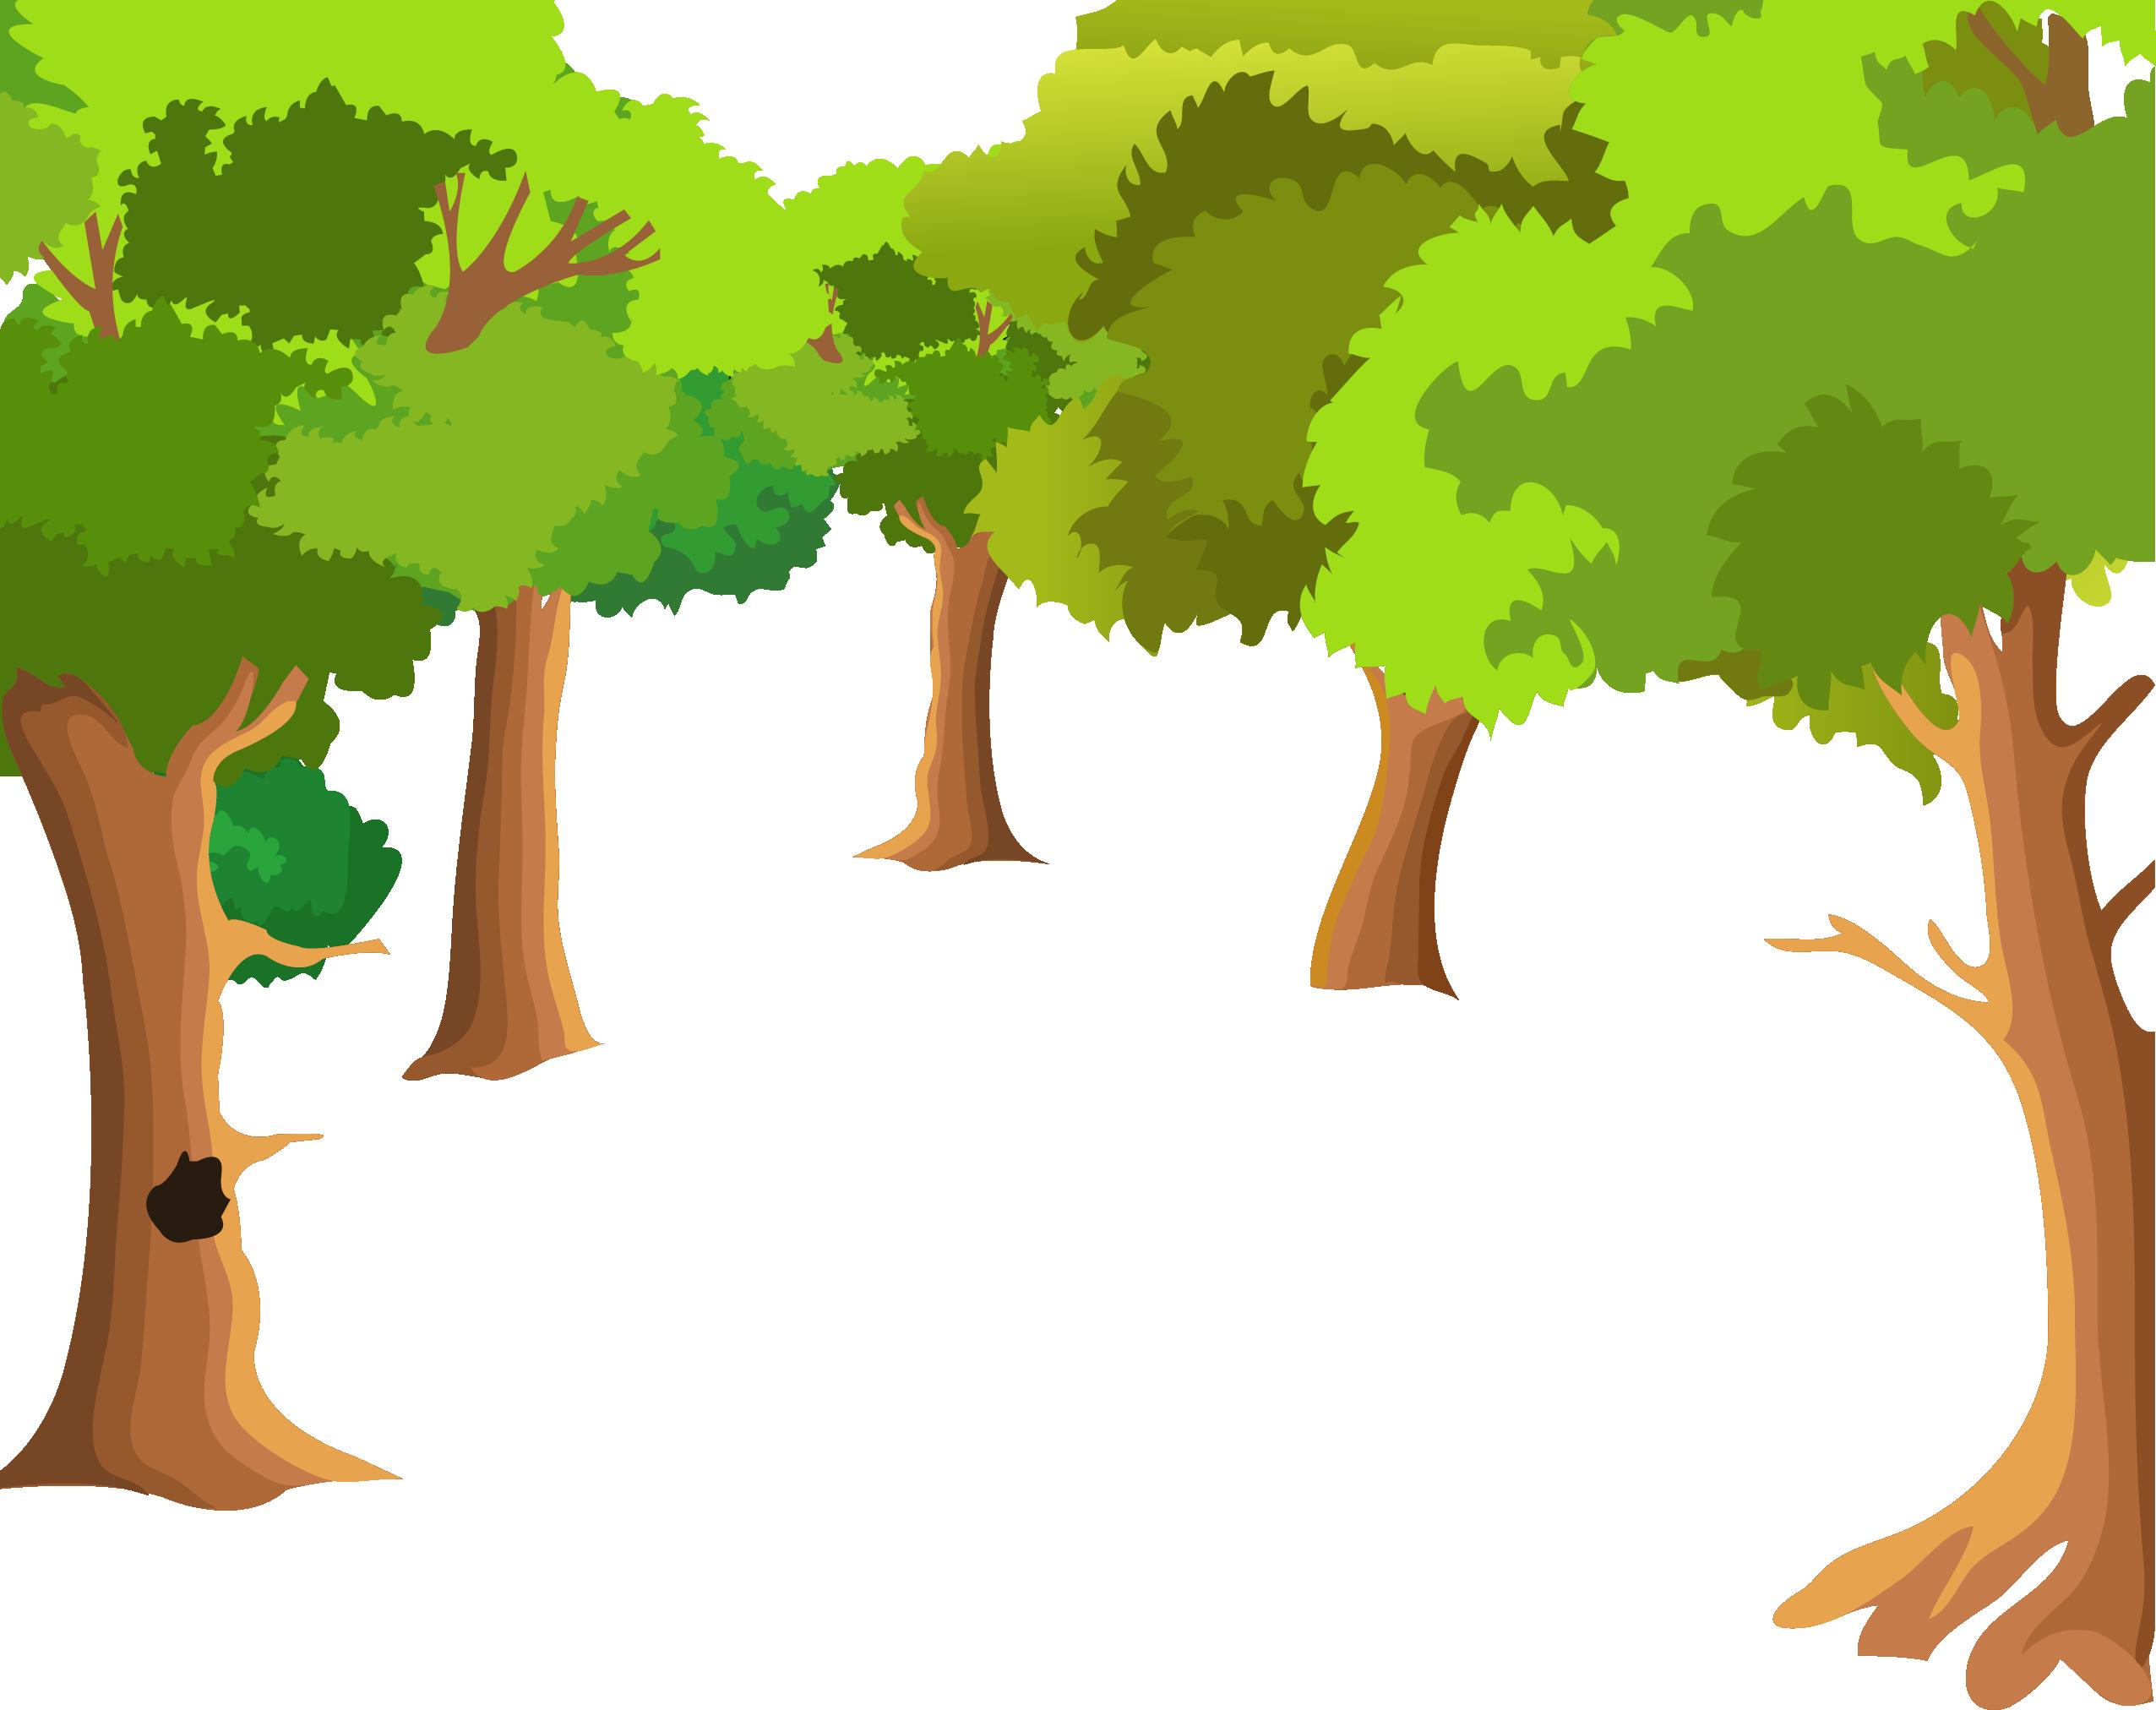 Landscaping kiwi tree frames. Landscape clipart hedge cutting